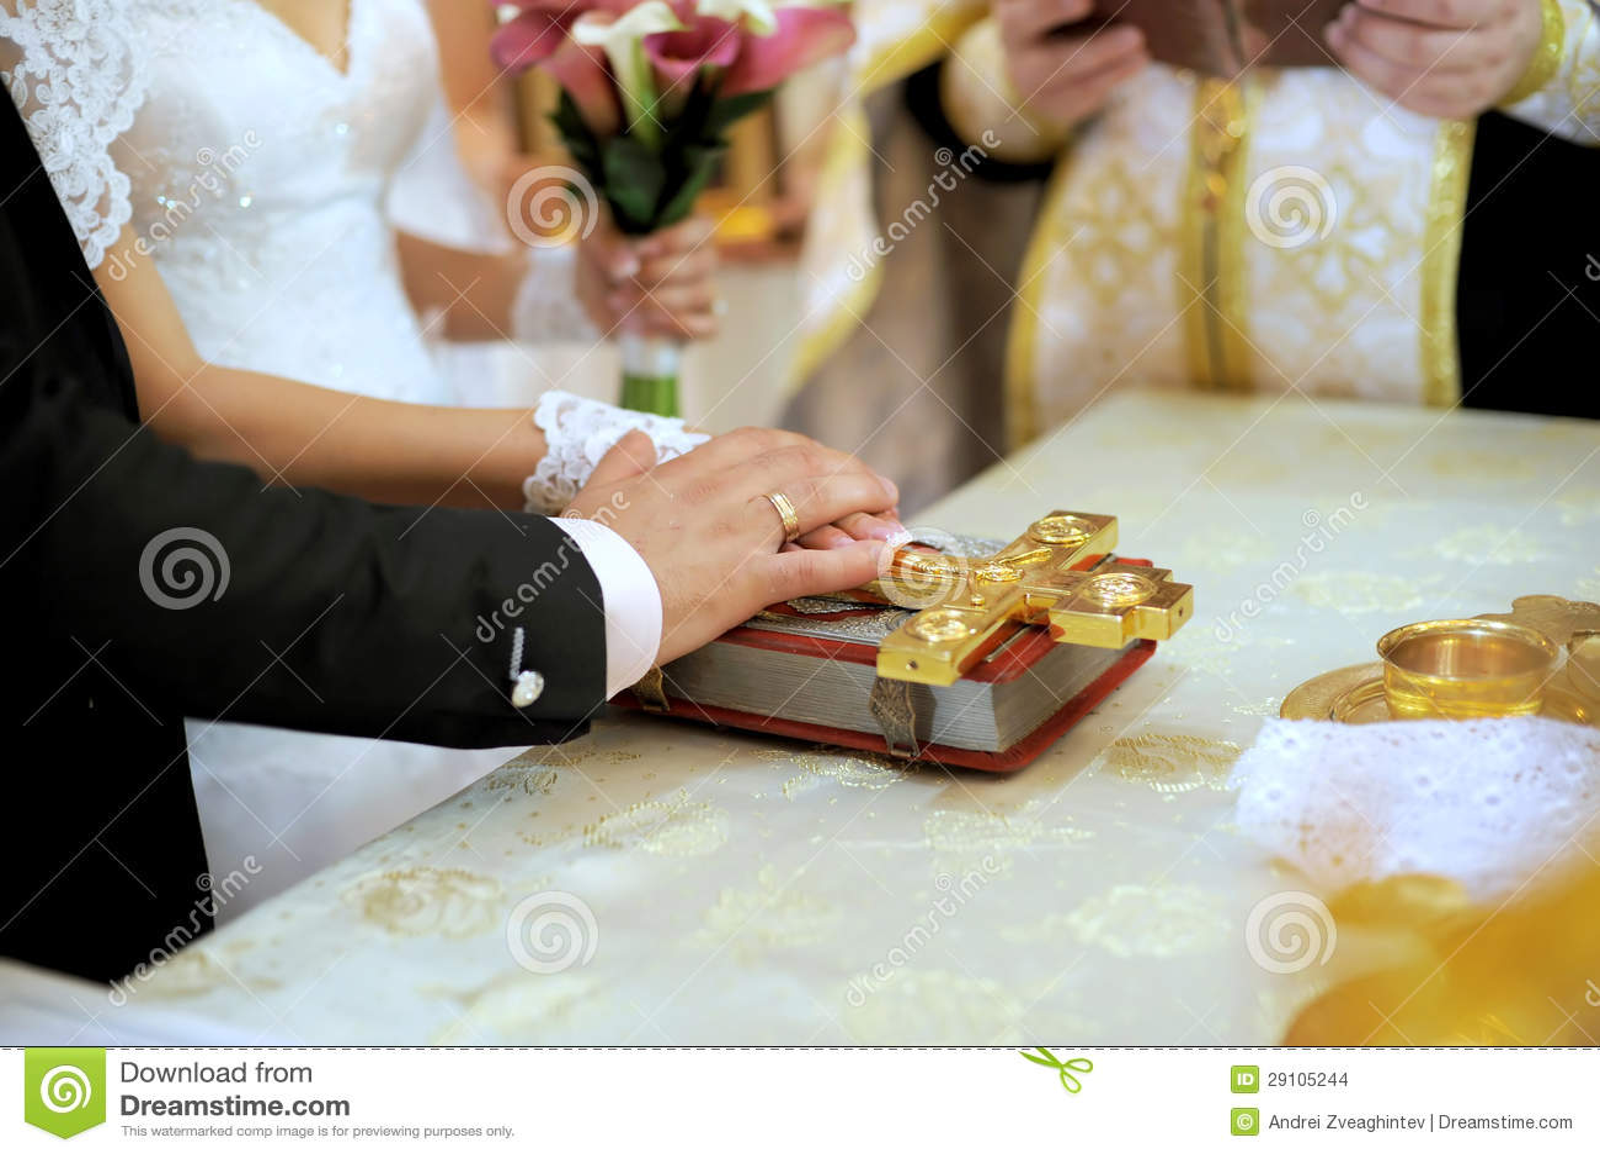 Voto de boda con la biblia foto de archivo. Imagen de prepare - 29105244